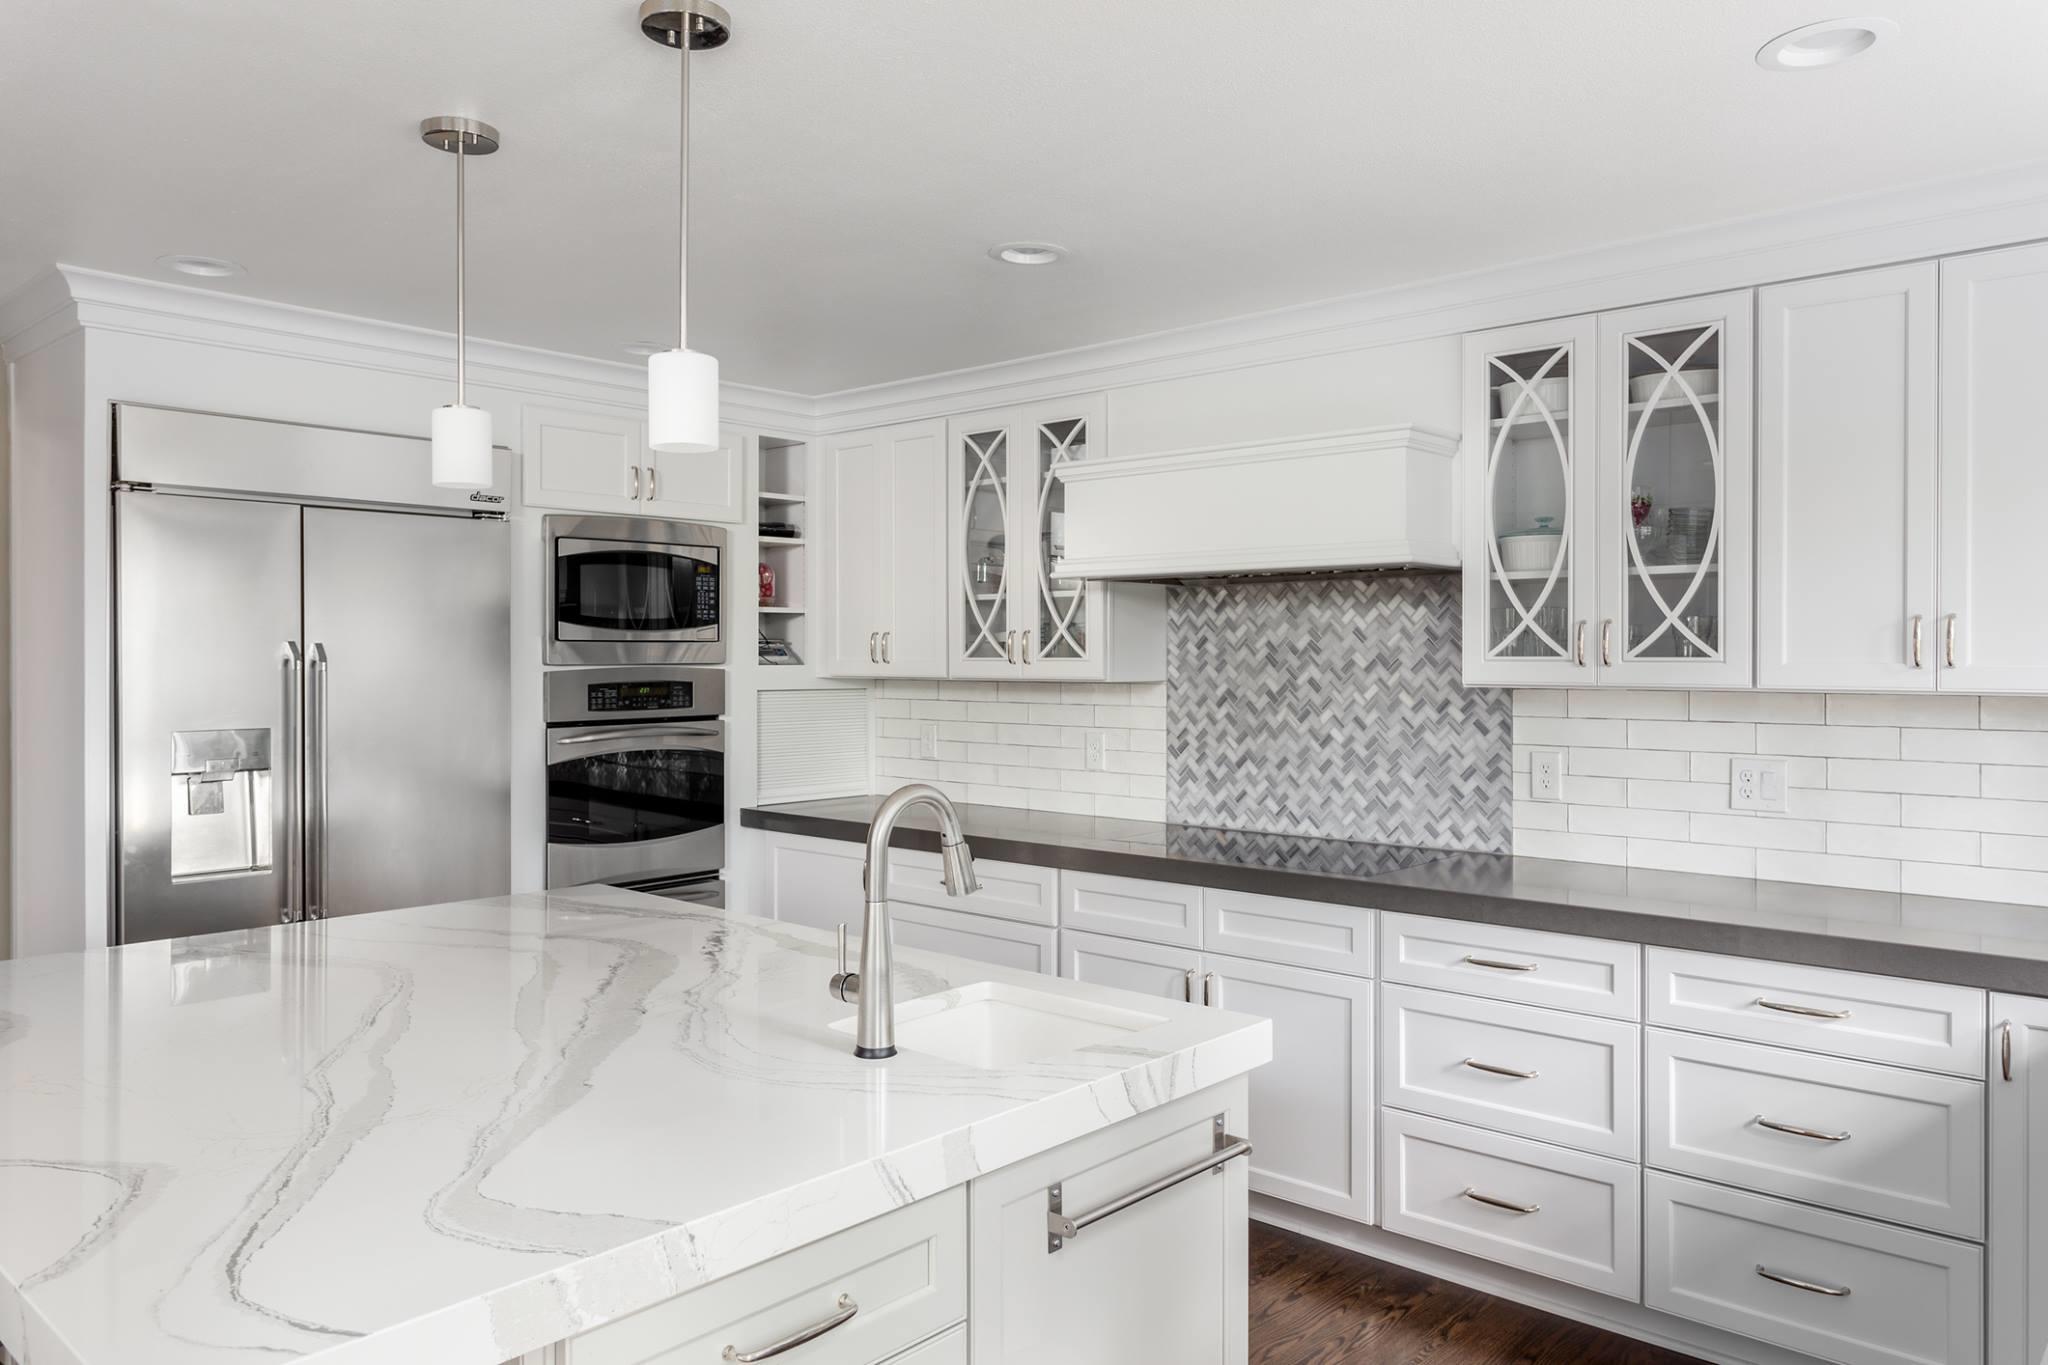 Alpha Kitchen Design image 1